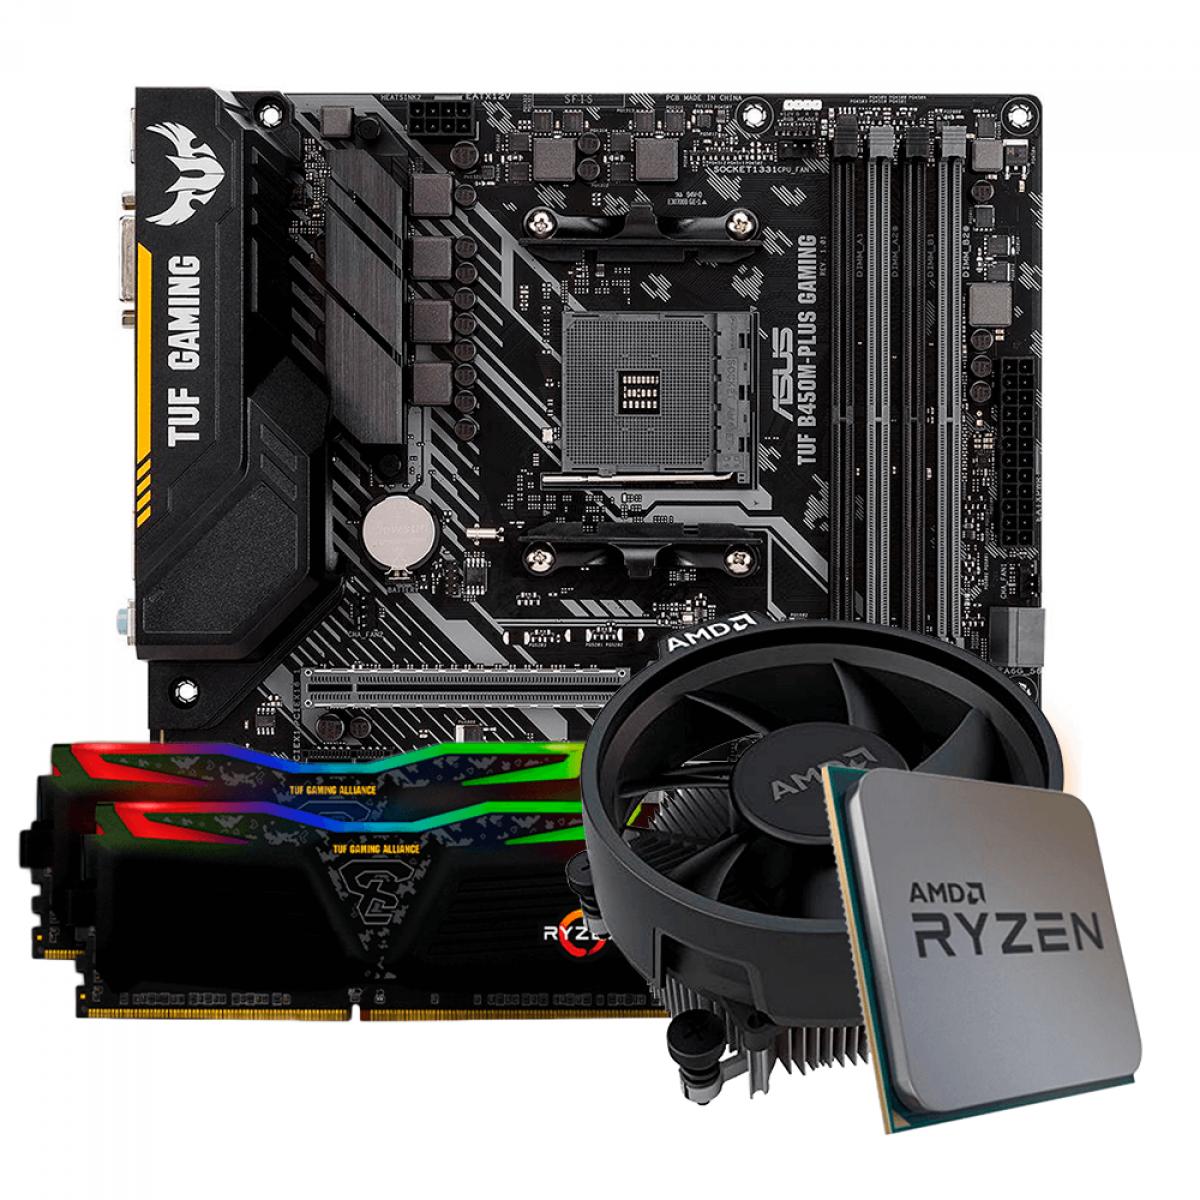 Kit Upgrade, AMD Ryzen 5 3600, Asus TUF B450M-PLUS GAMING, Memória TUF DDR4 16GB (2x8GB) 3000MHz